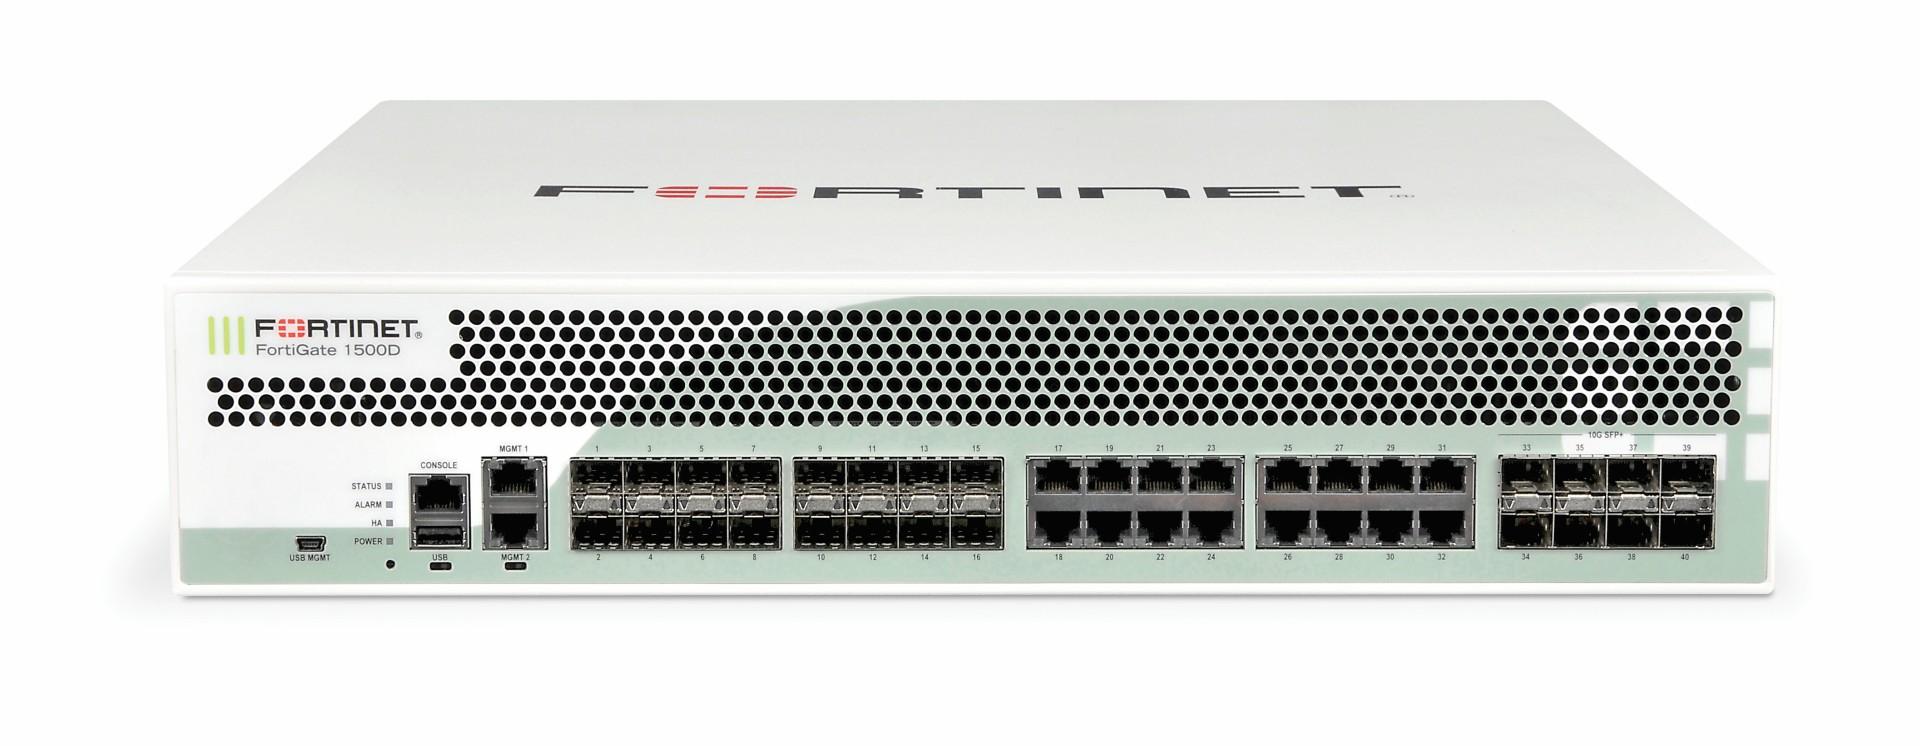 Fortinet launches new next-gen firewall